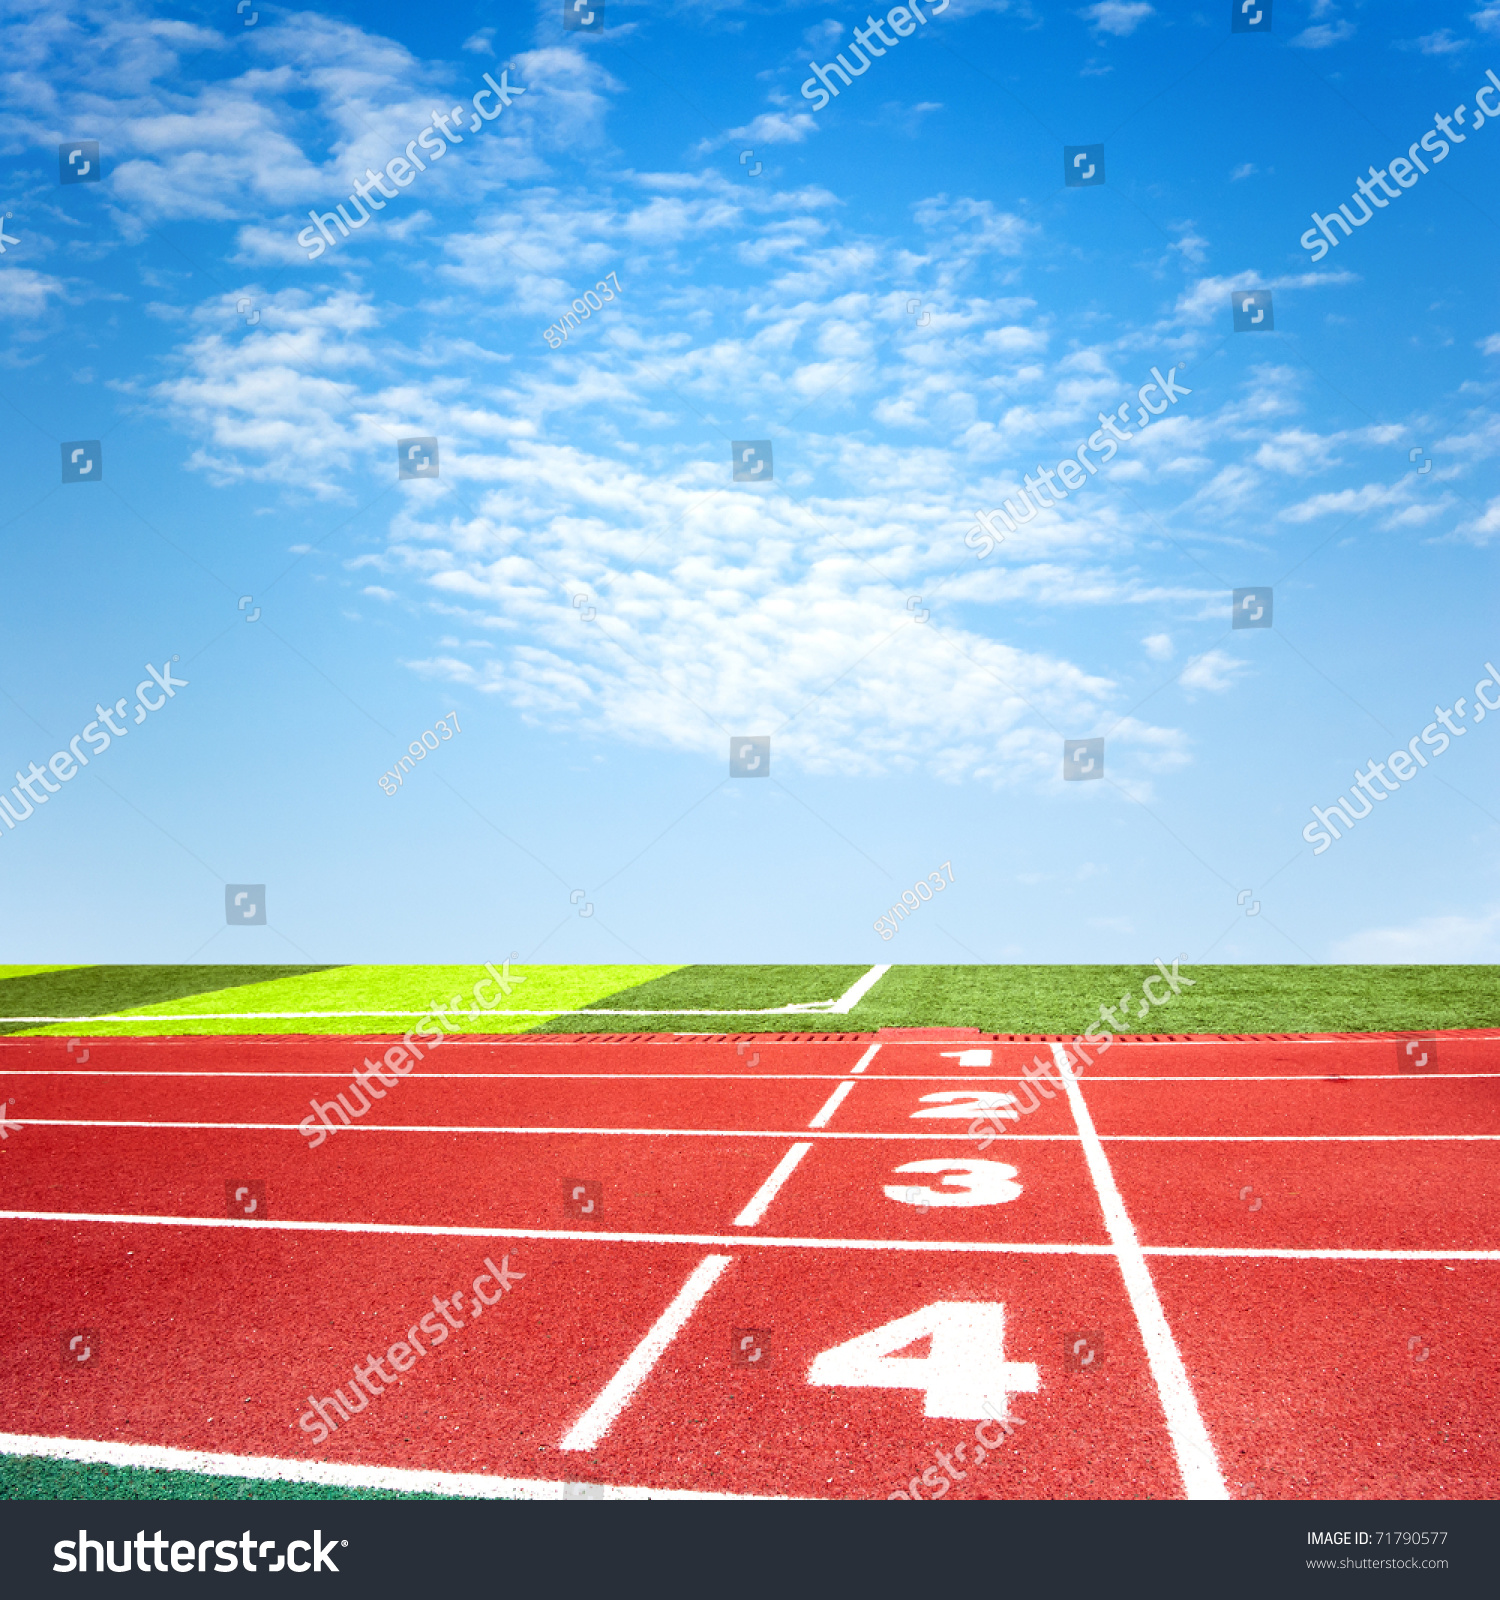 Athletics Track Under Blue Sky Stock Photo 71790577 : Shutterstock